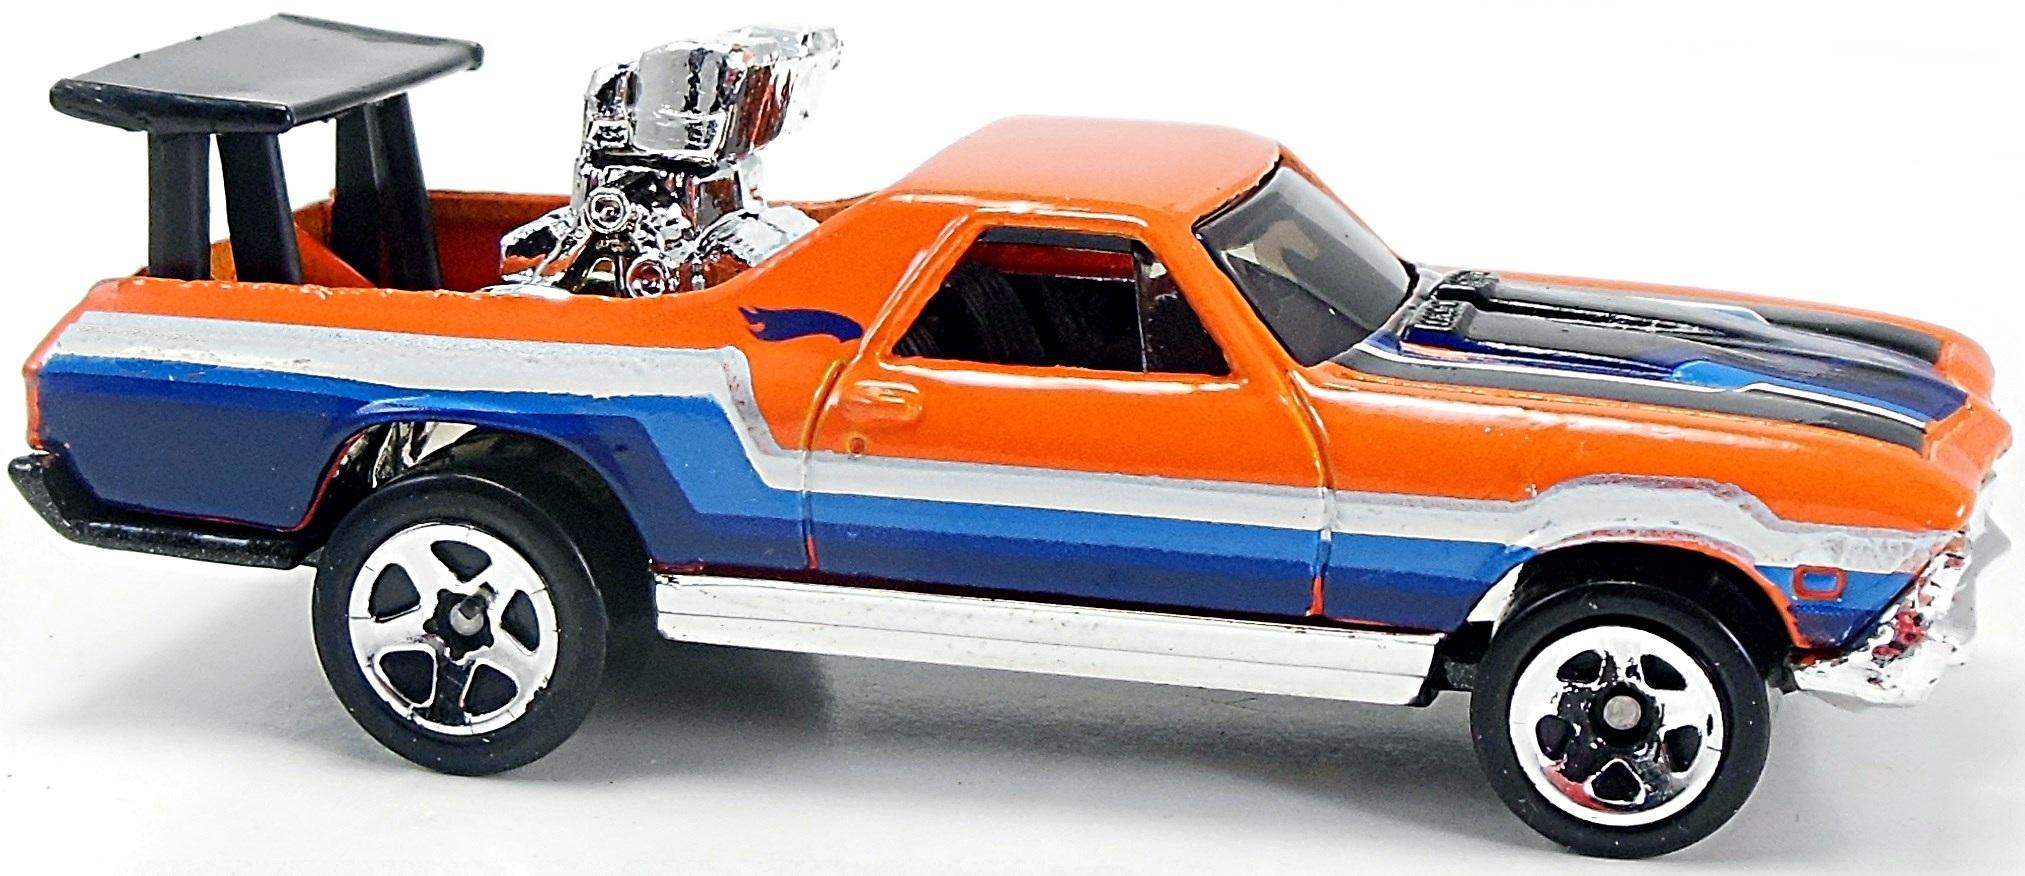 Details about  /Hot Wheels /'68 El Camino #200